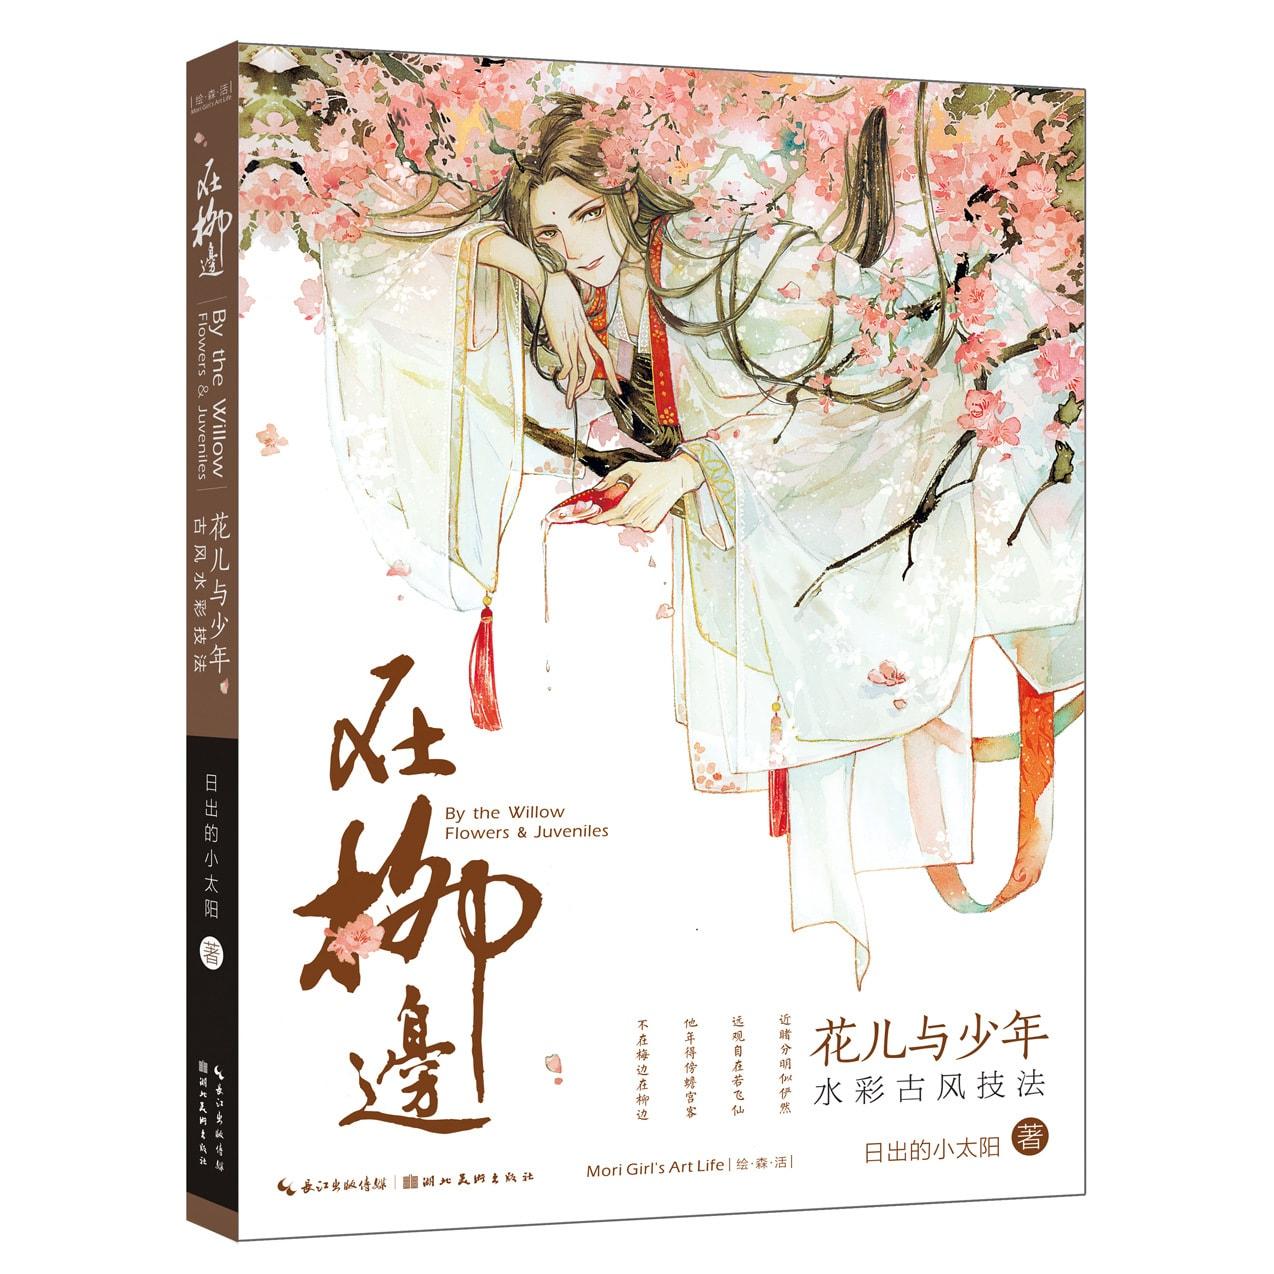 Yamibuy.com:Customer reviews:绘森活-在柳边-花儿与少年水彩古风技法